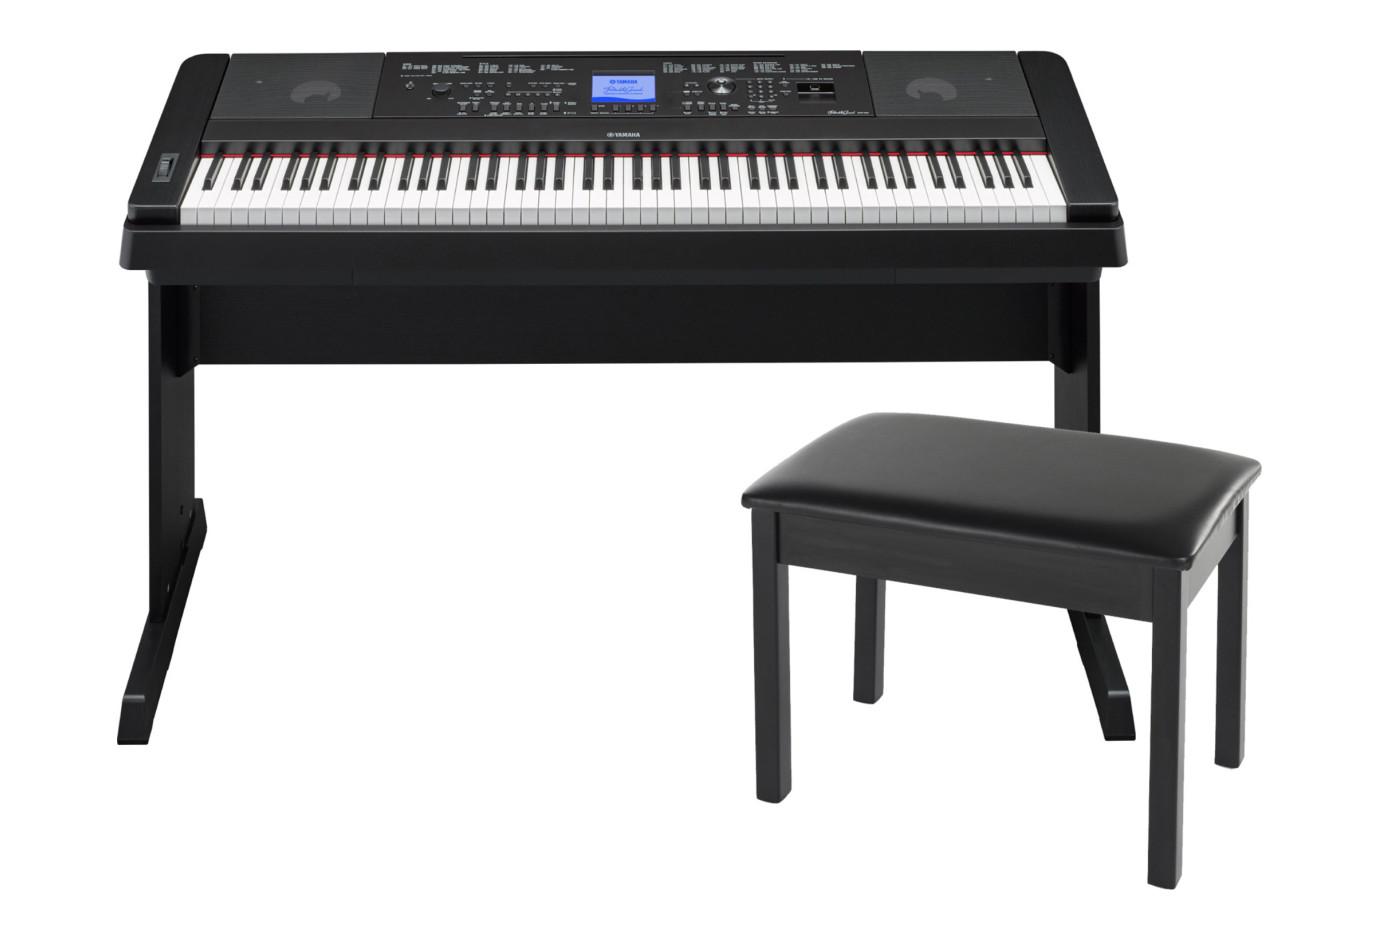 Yamaha dgx 660 88 key black digital piano bundle for Yamaha 660 keyboard